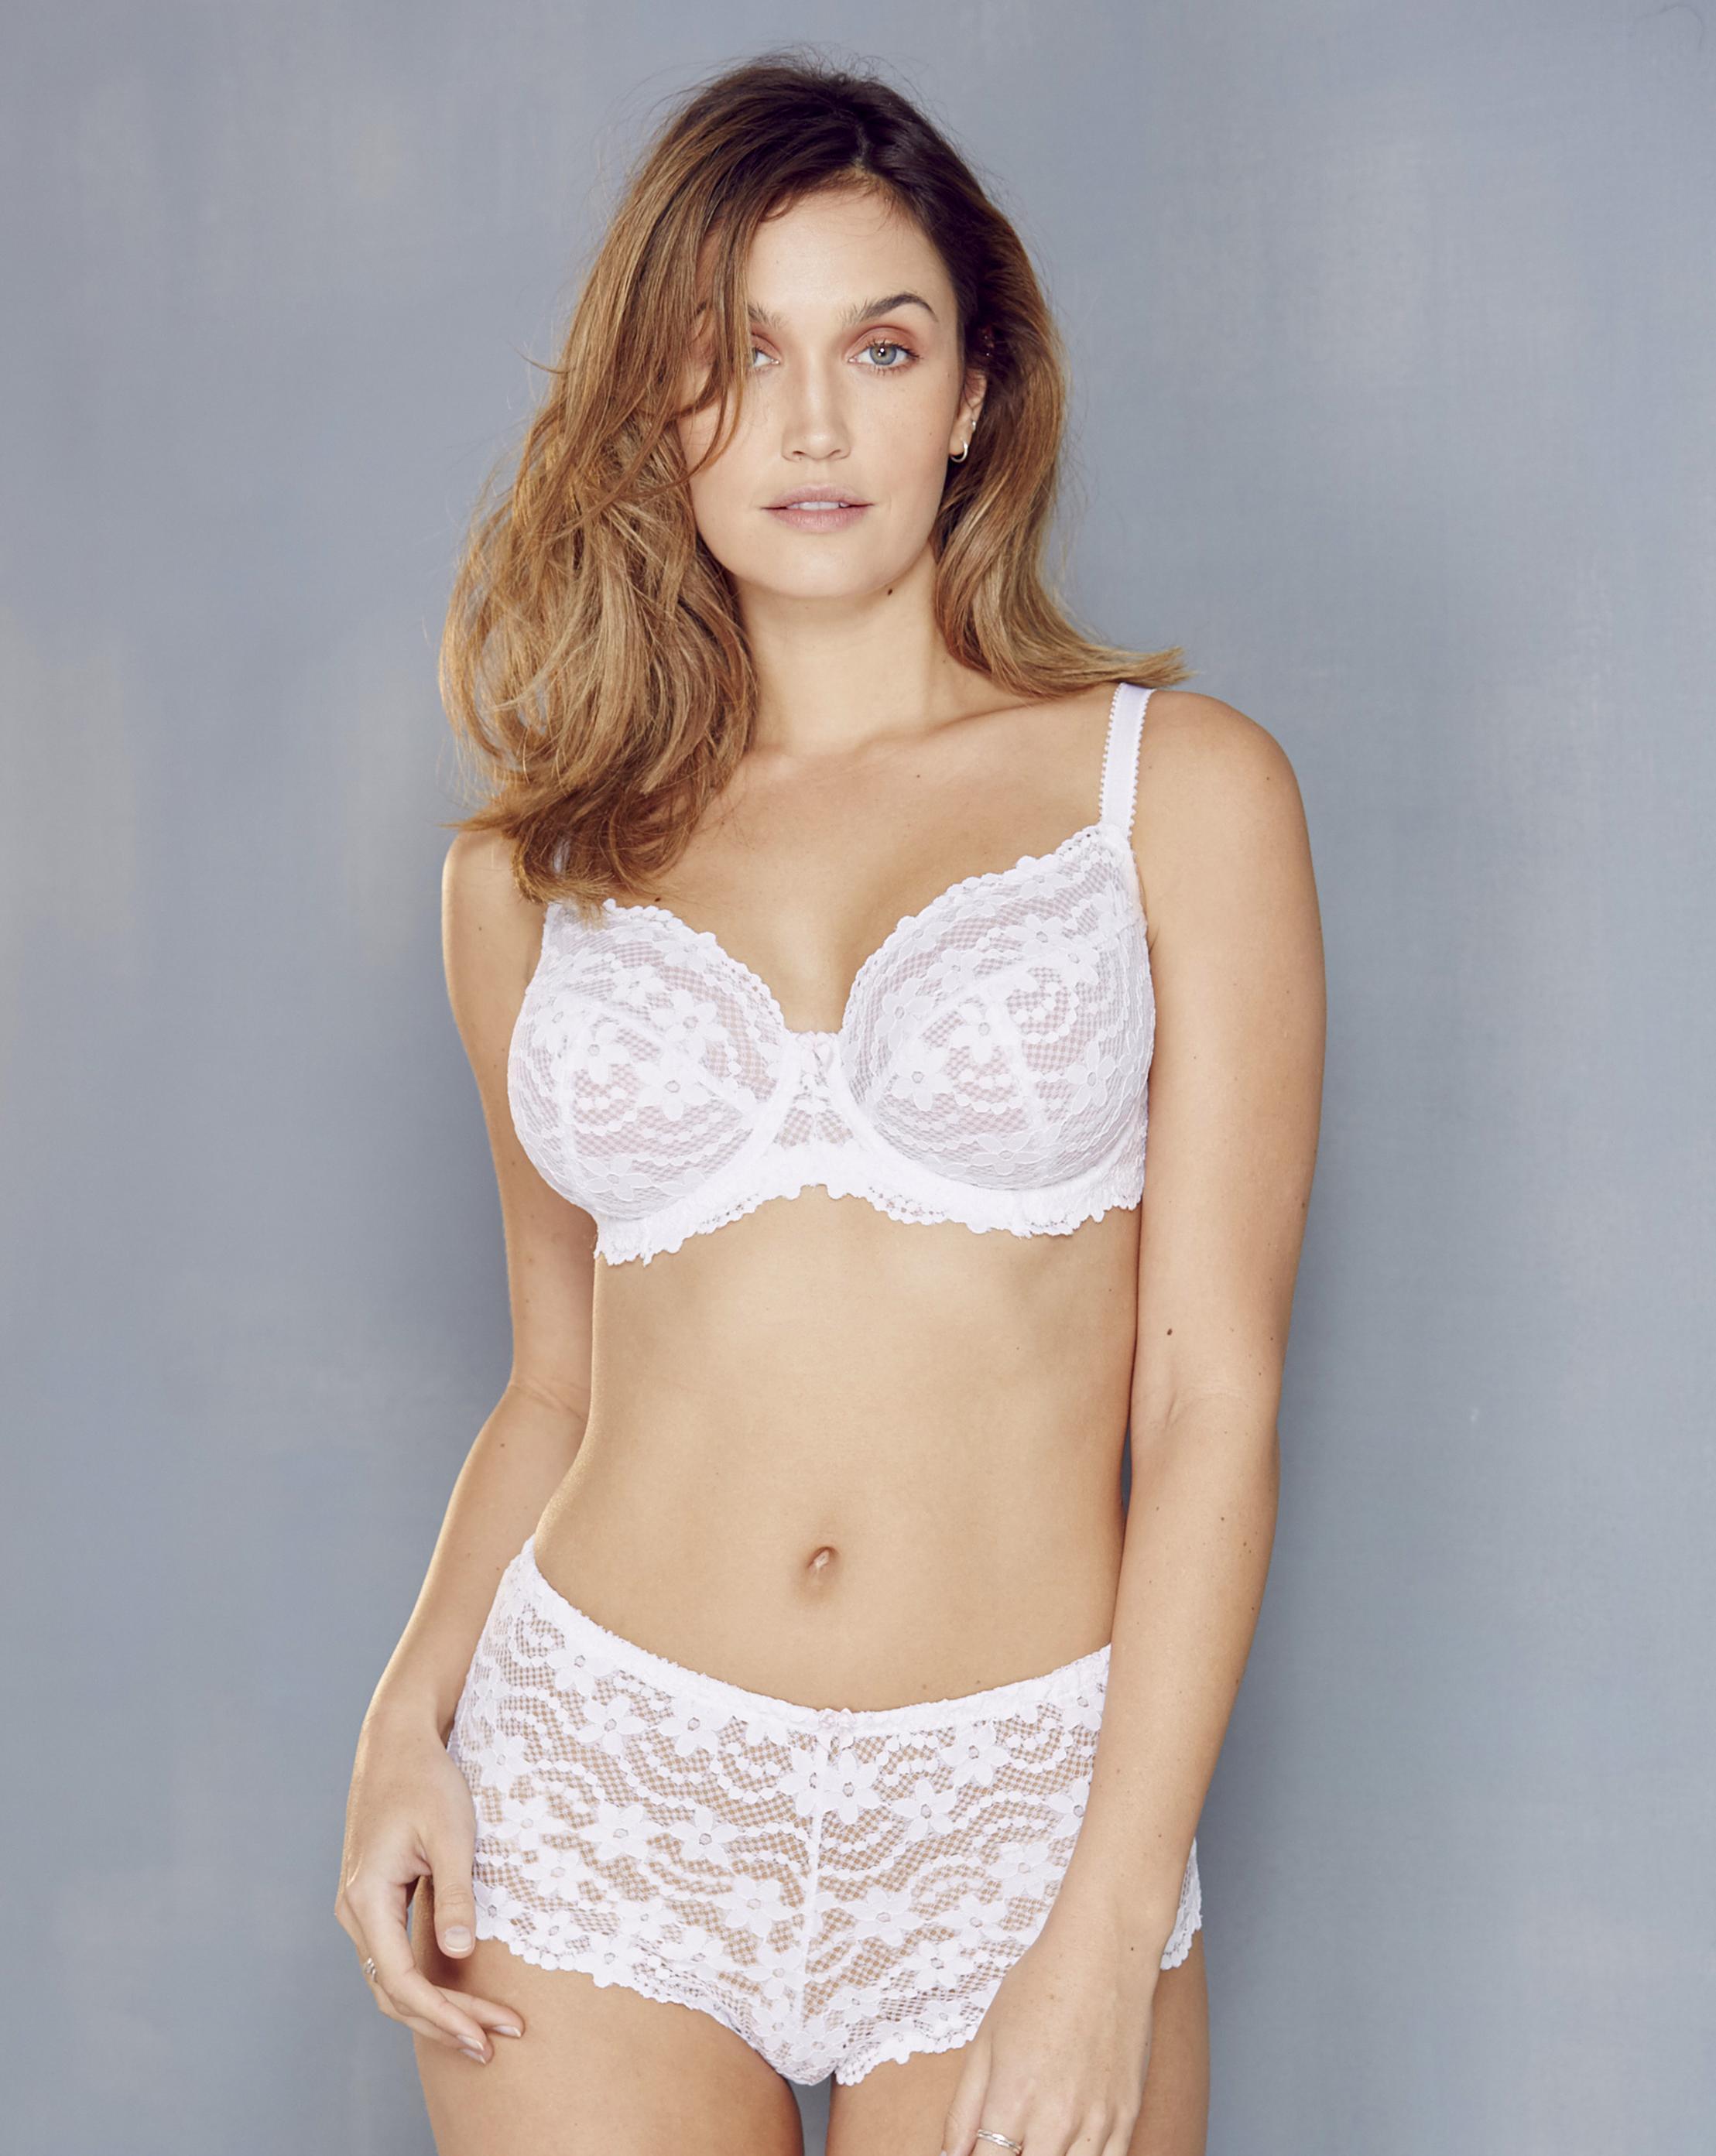 348ddaff7b55a Lyst - Simply Be Pretty Secrets Daisy Lace Full Cup Wired Bra in White